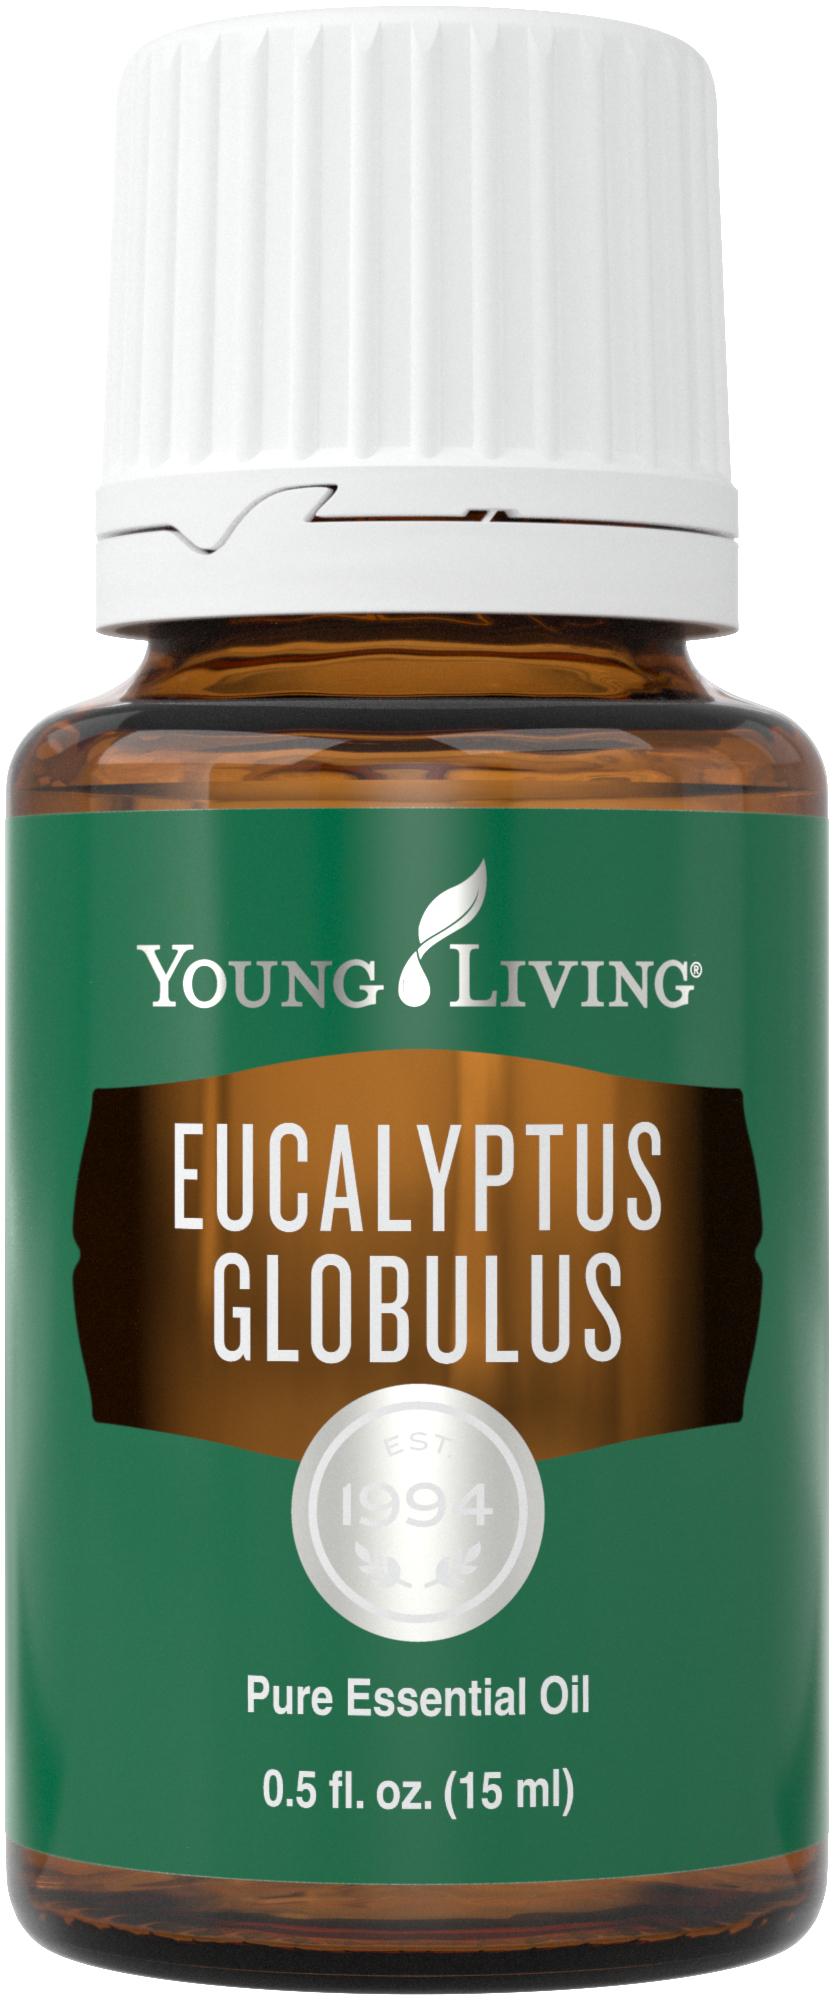 Eucalyptus Globulus Essential Oil - Young Living Essential Oils